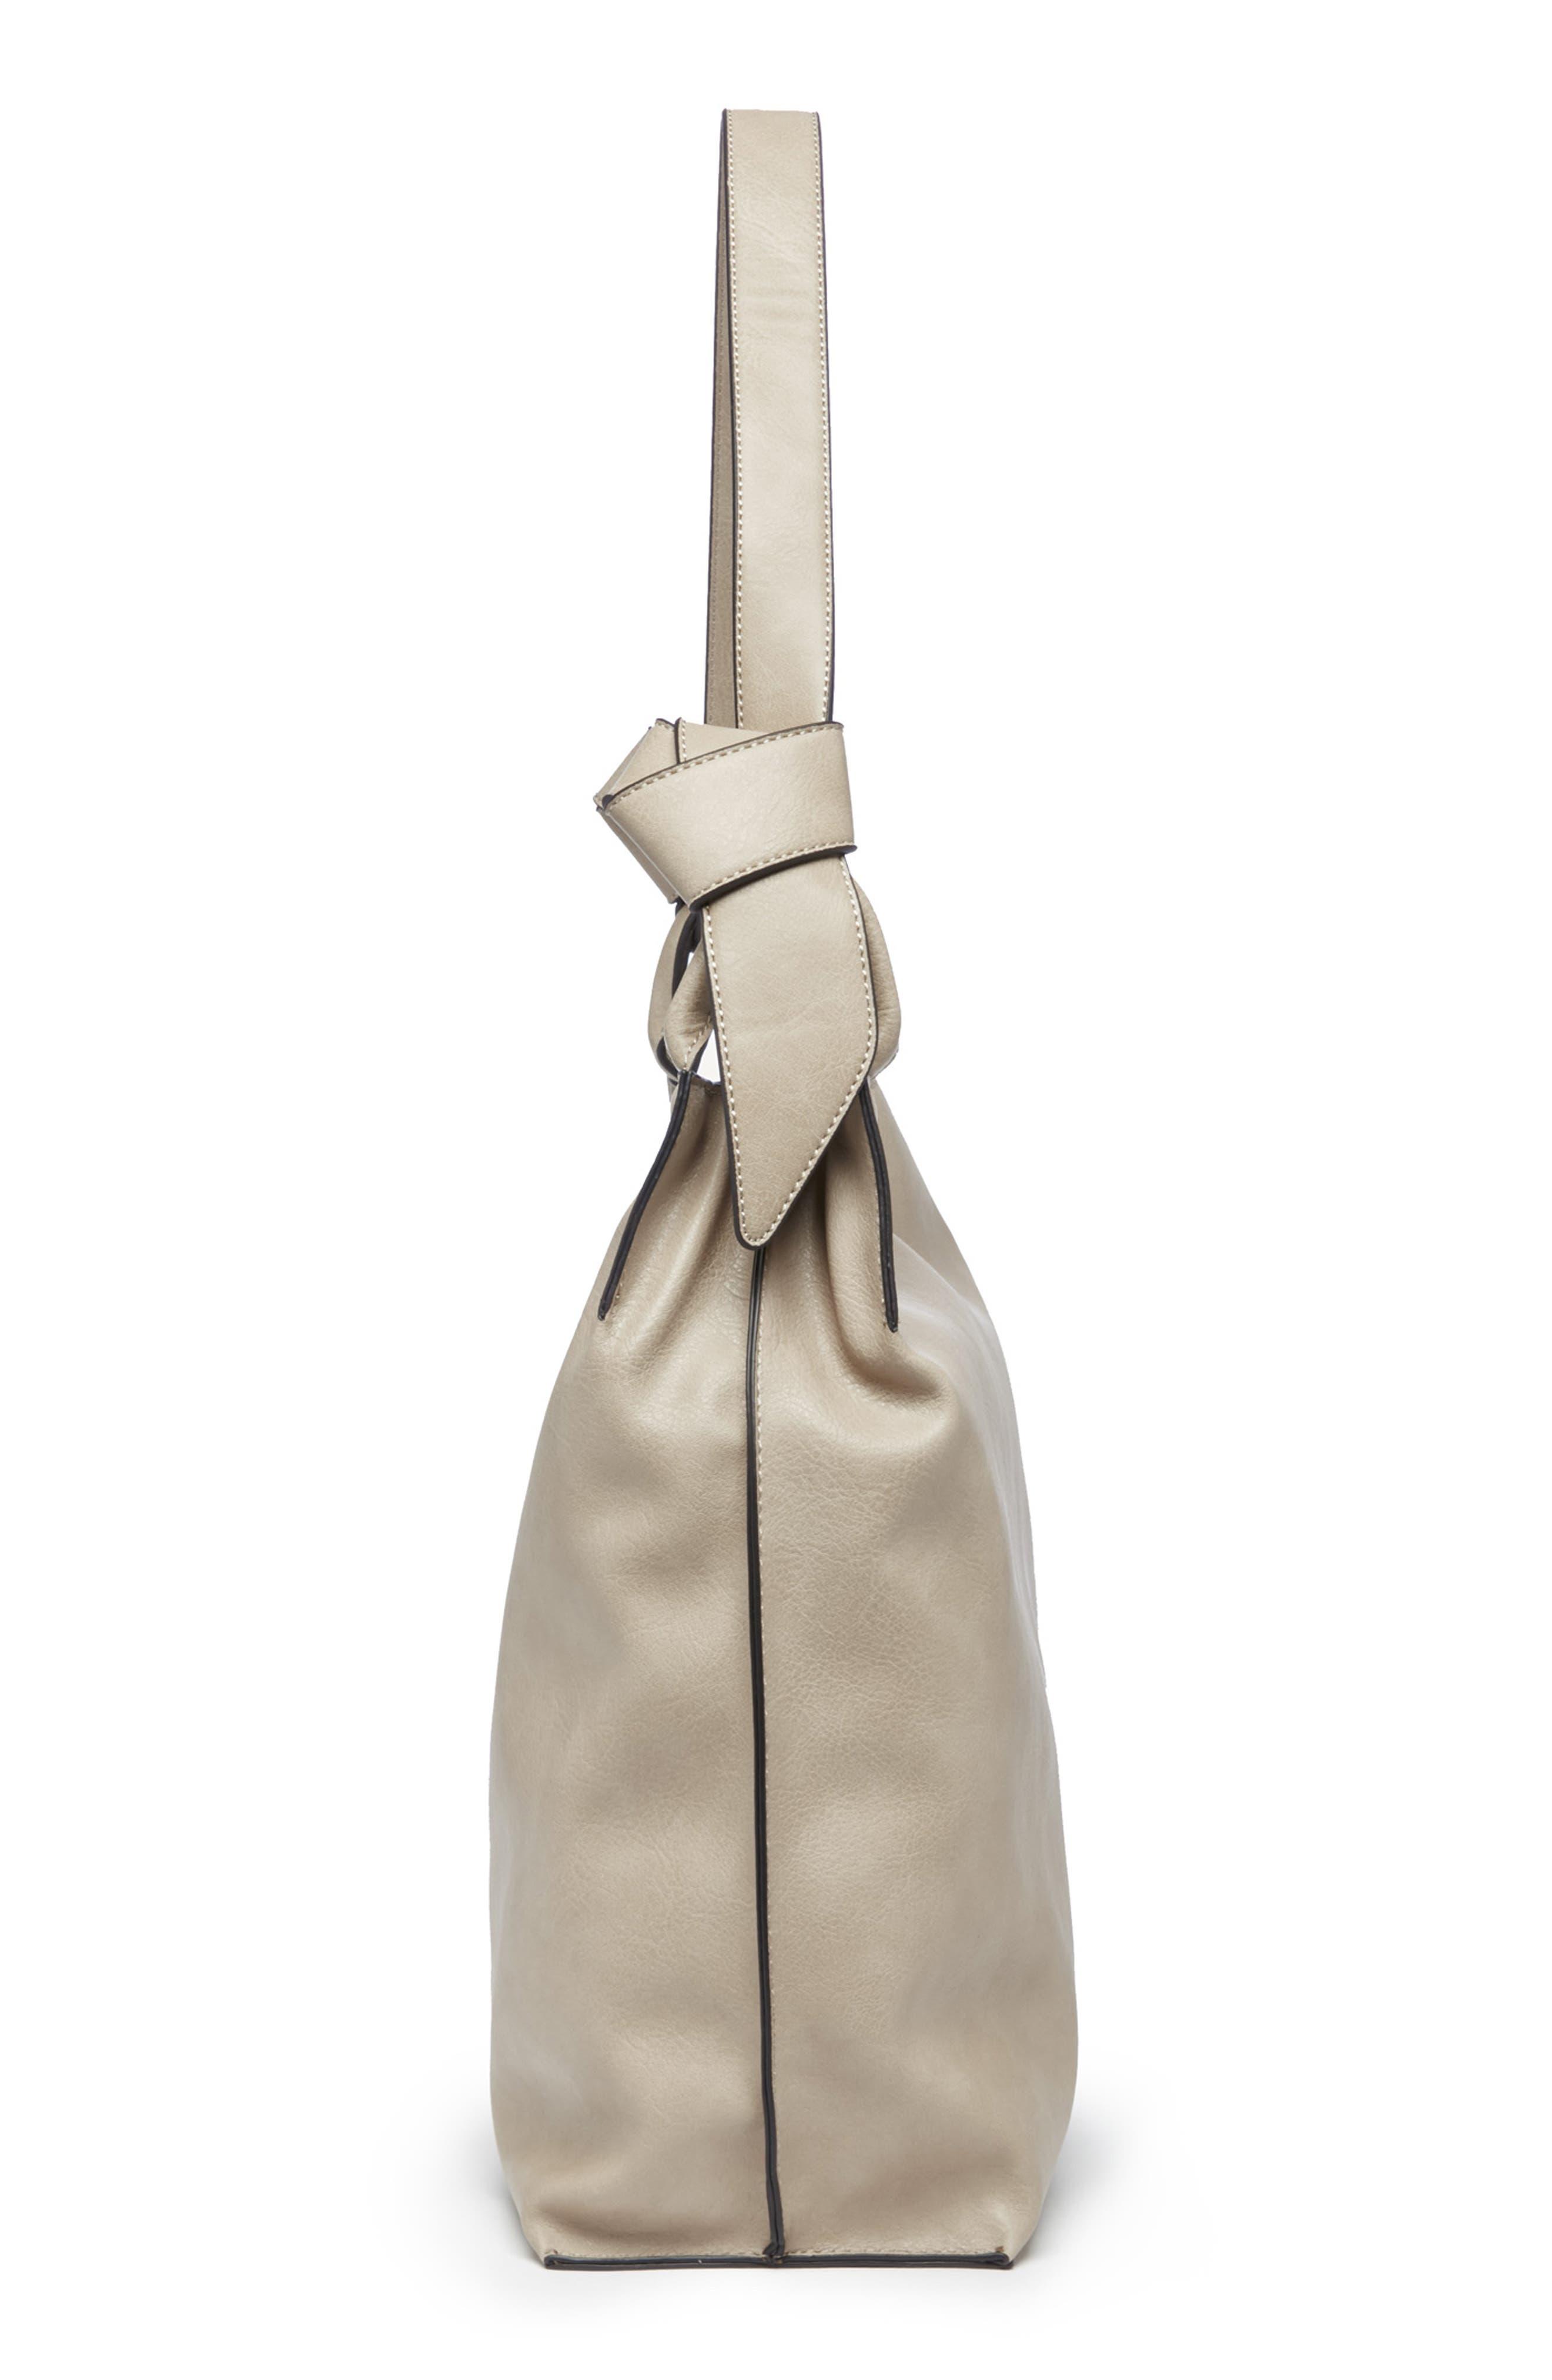 Josah Faux Leather Shoulder Bag,                             Alternate thumbnail 8, color,                             SAFARI